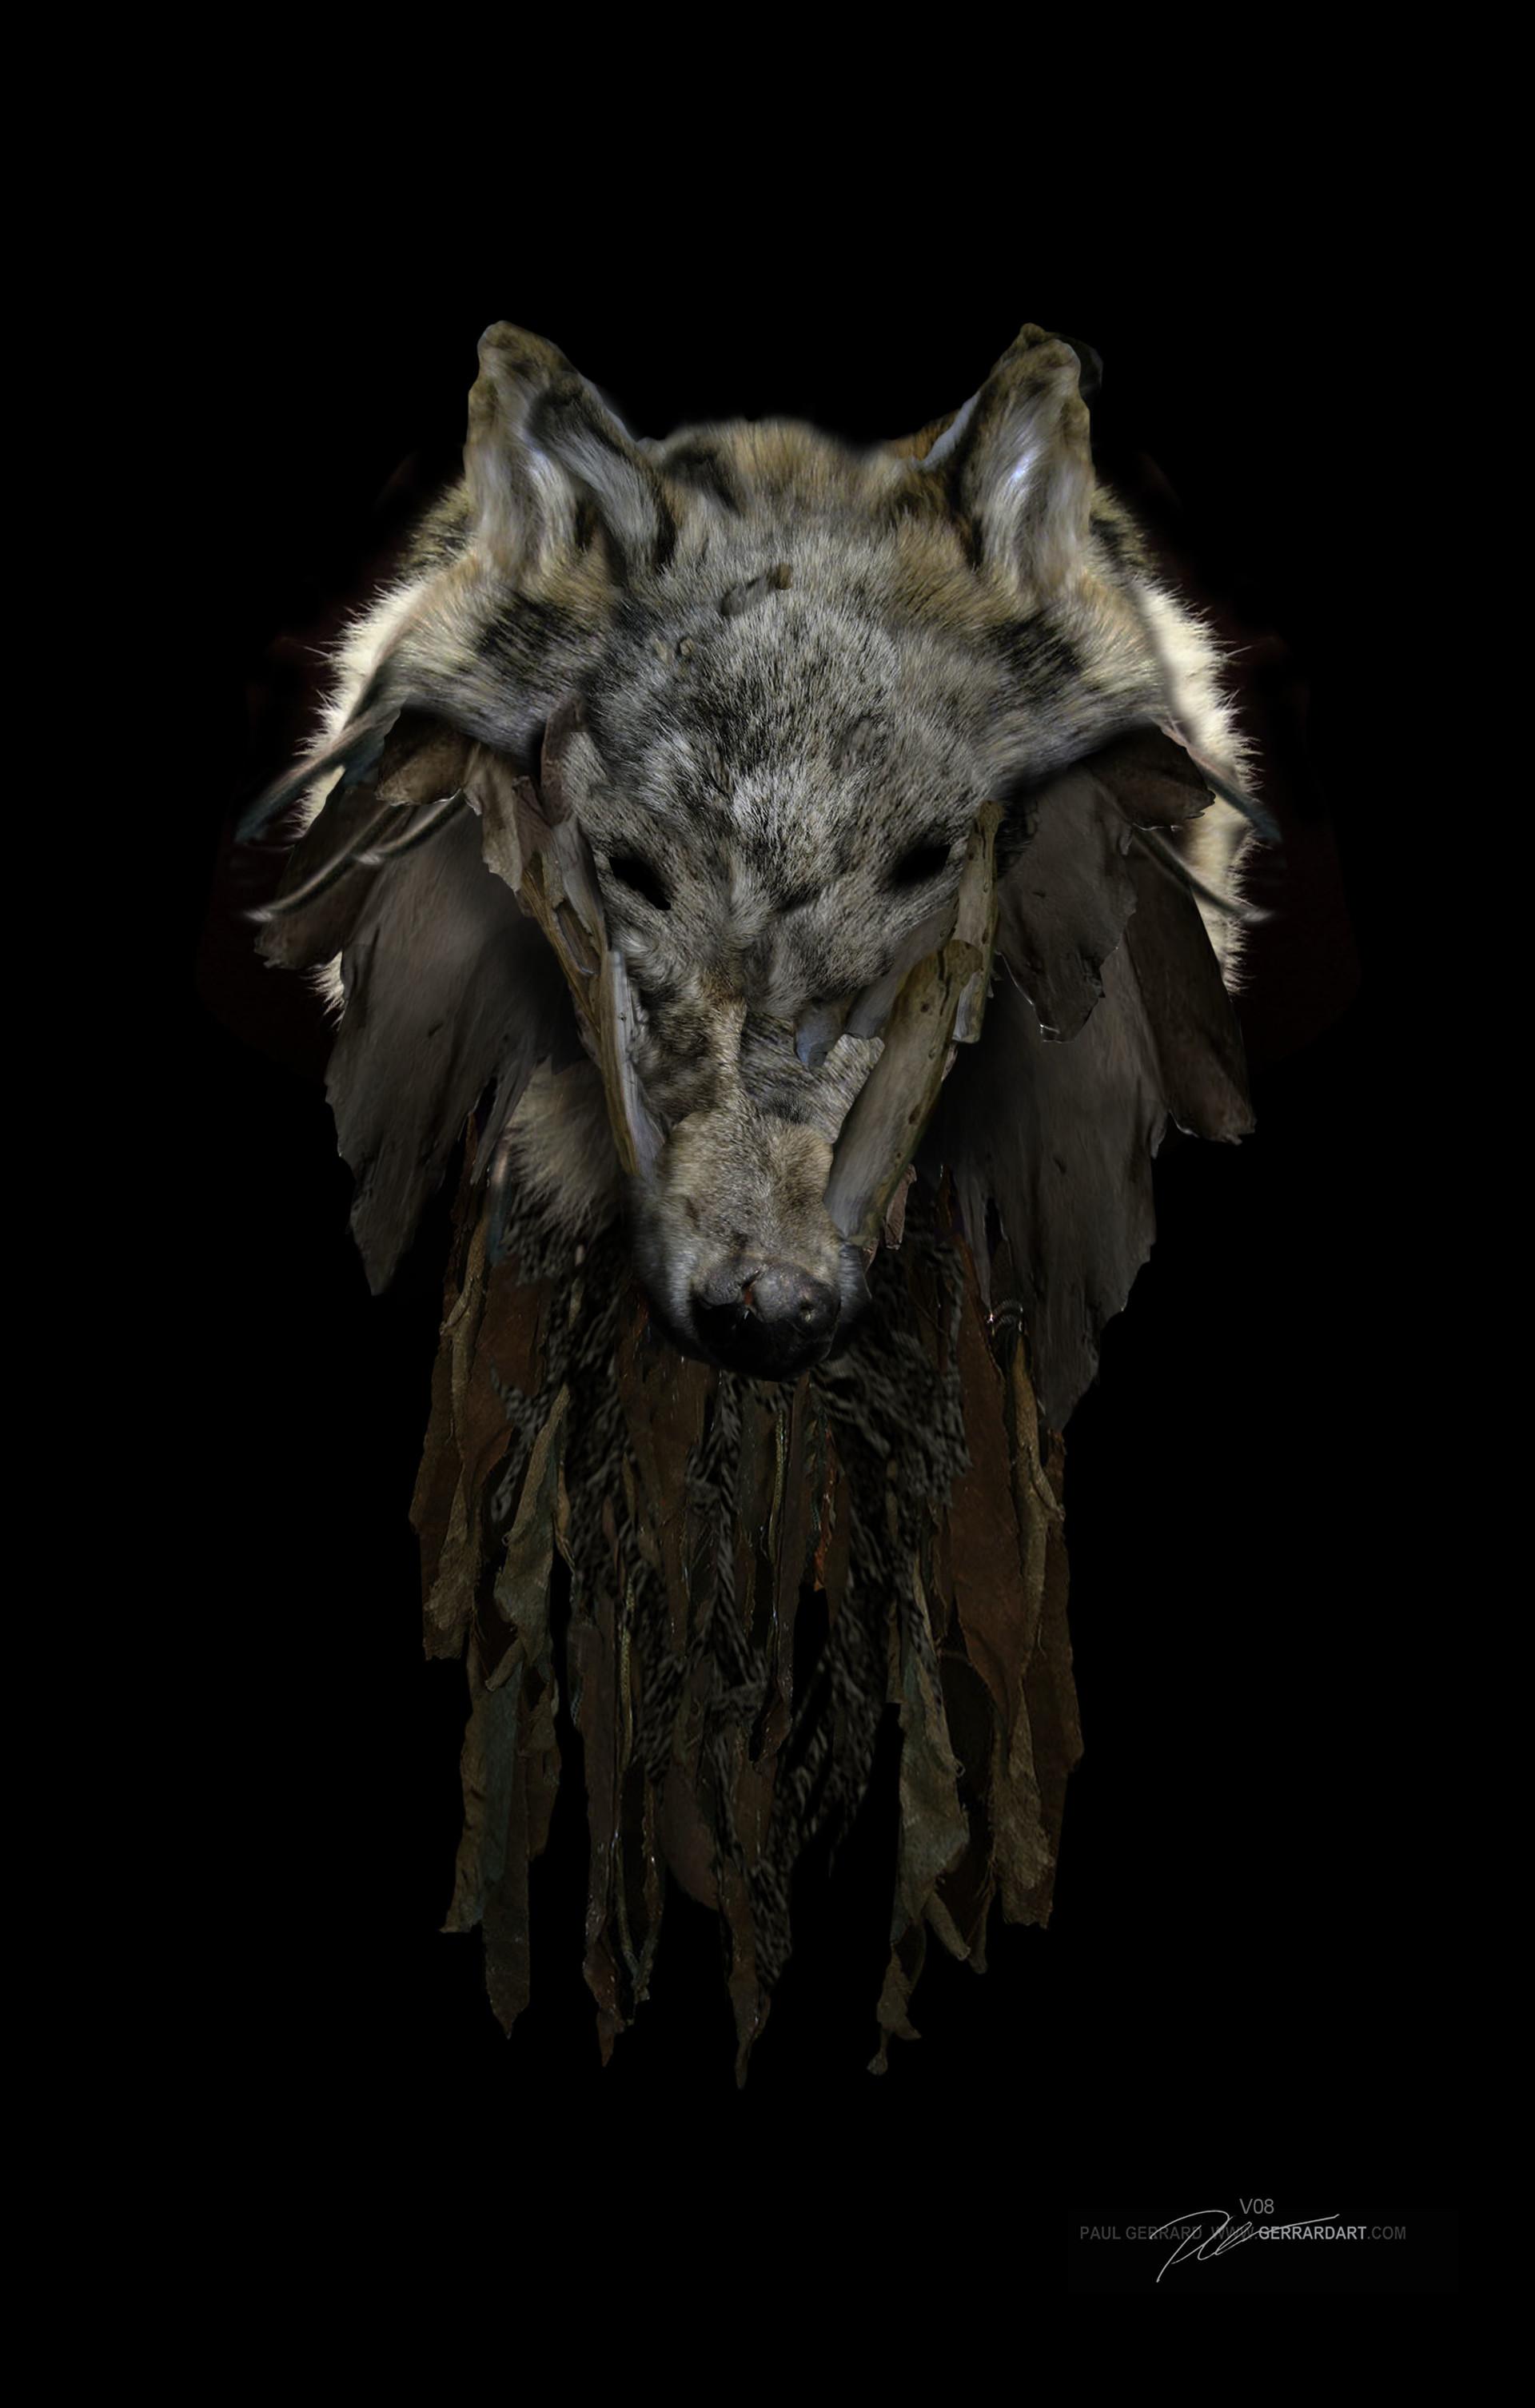 Paul gerrard wolf 08